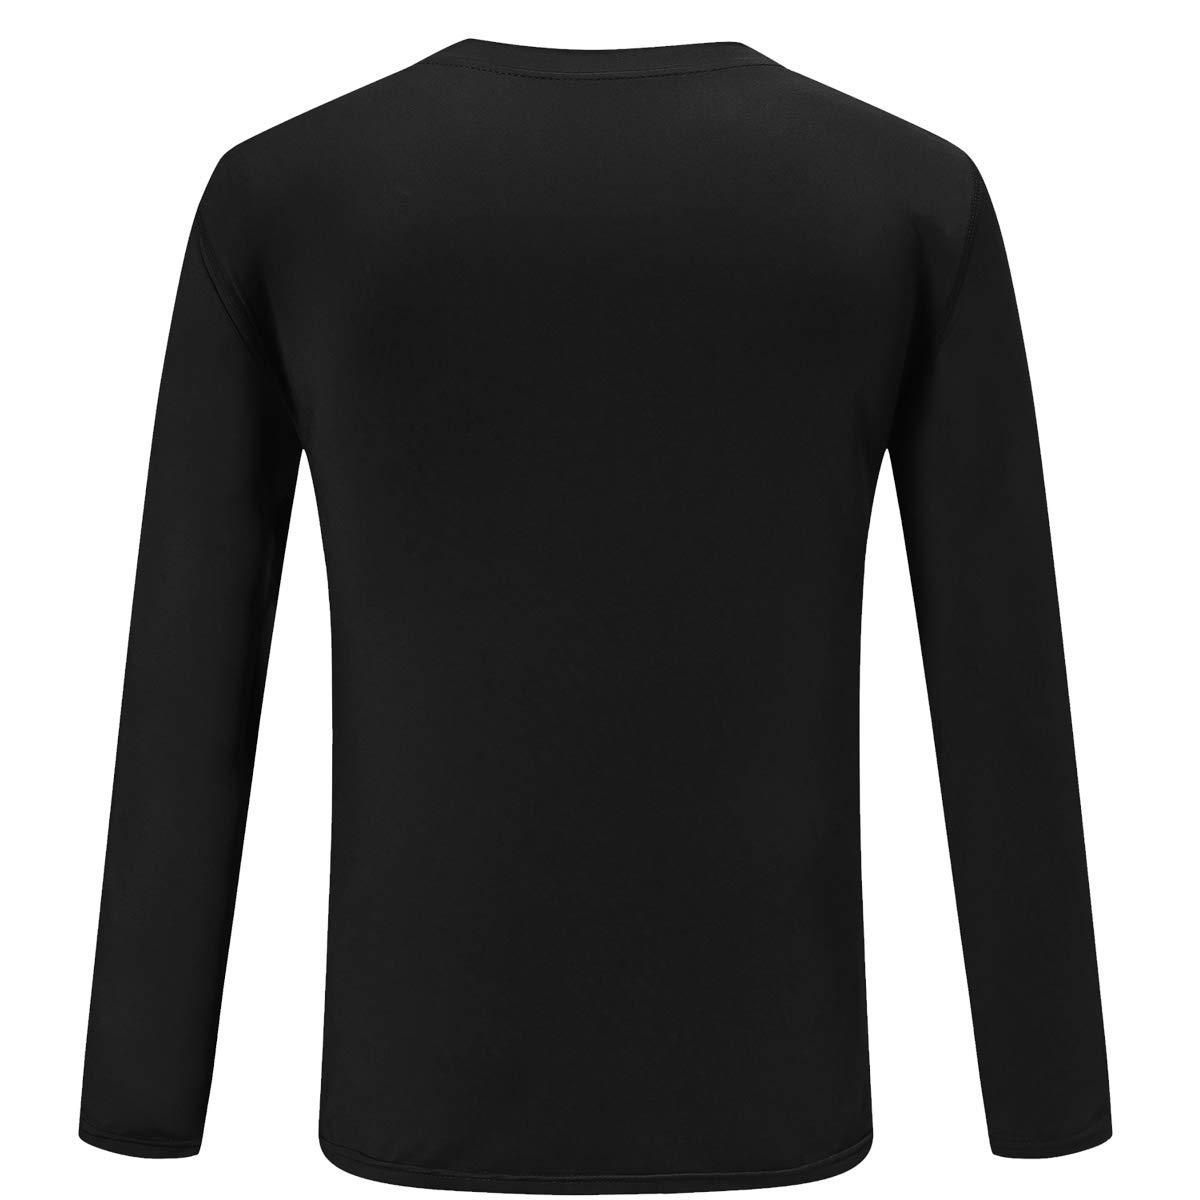 TELALEO Boys/' Girls/' Youth Athletic Performance Long Sleeve T Shirts Cool Dri Fit Moisture Wicking UPF 50+